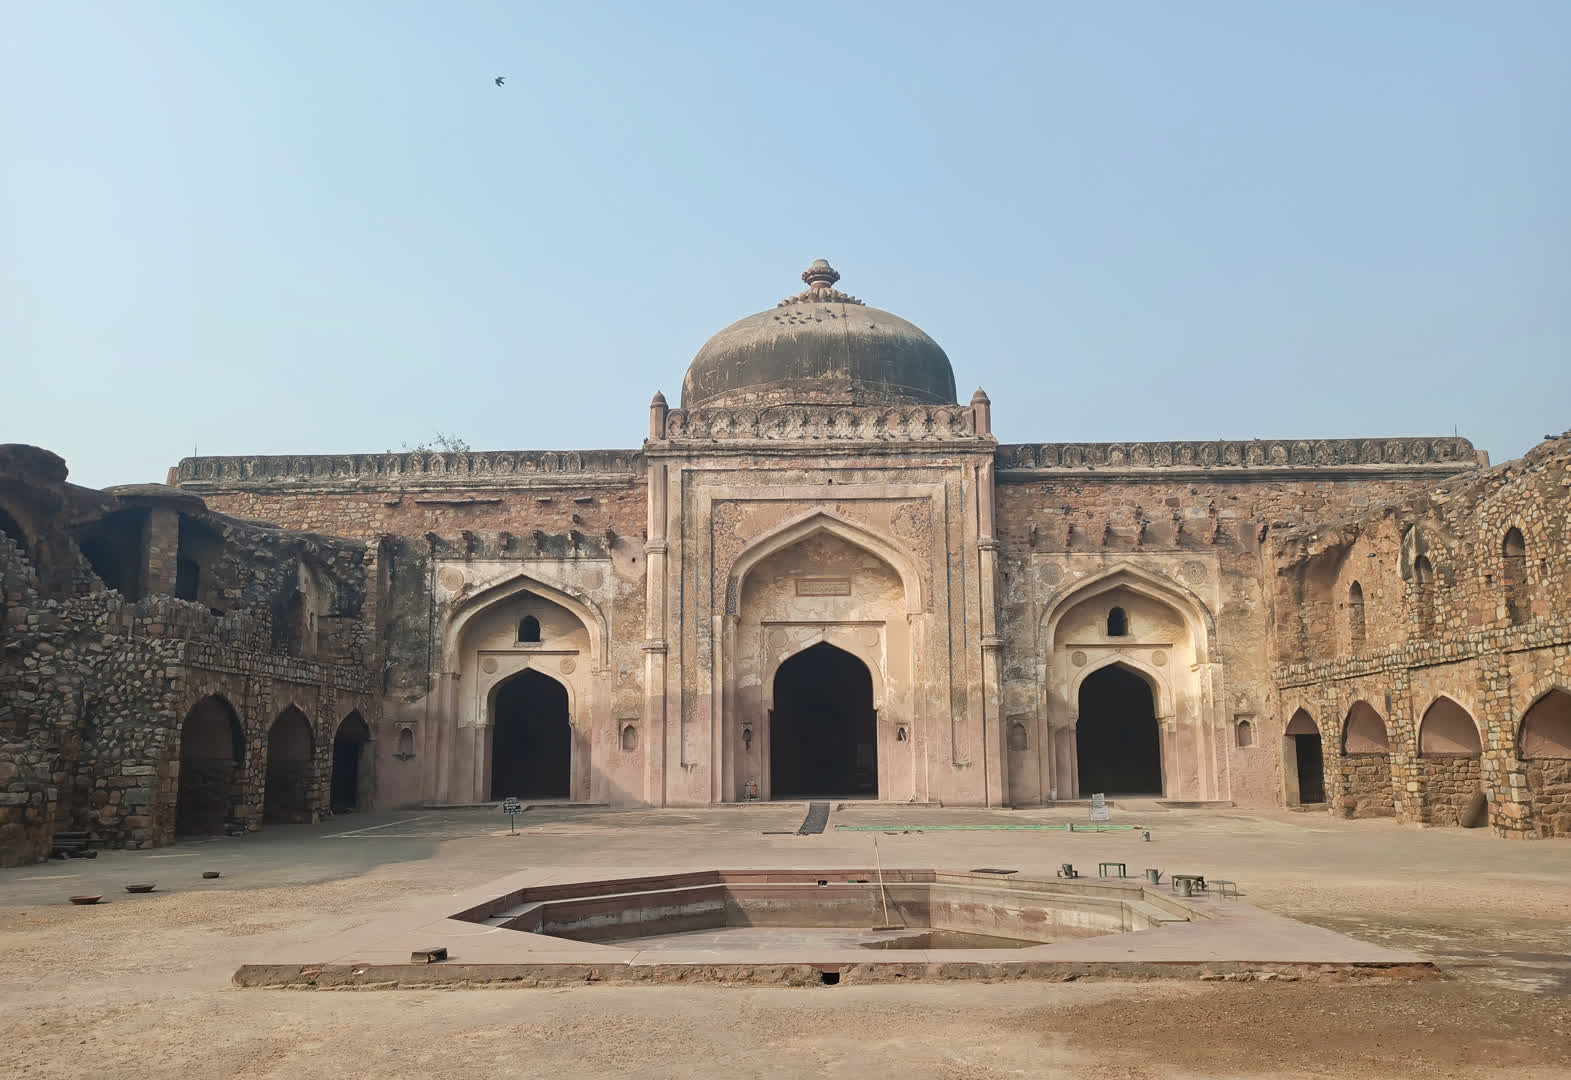 The mosque at Khair-ul-Manzil